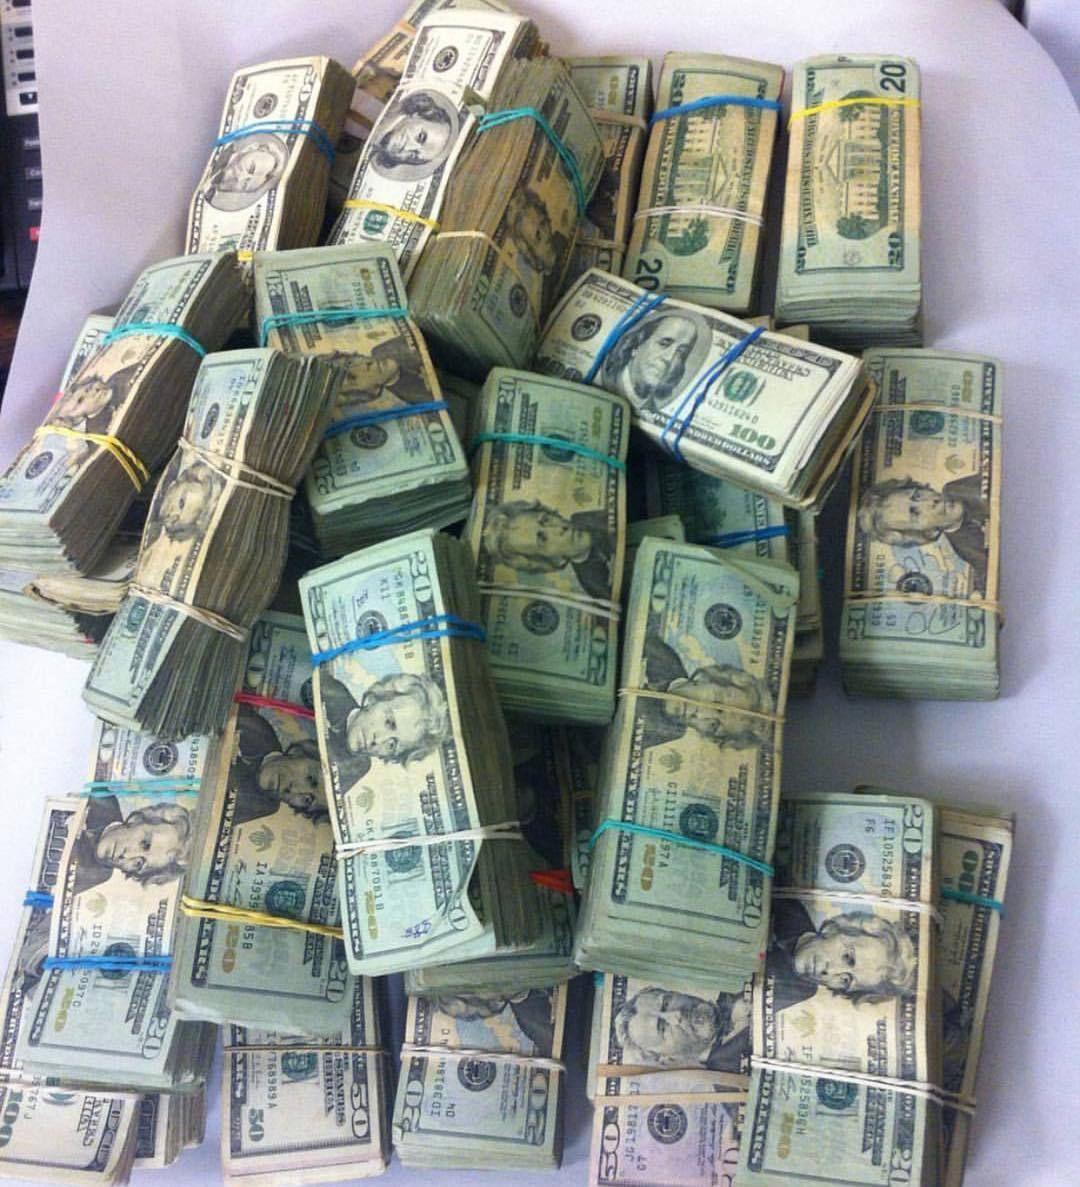 Get Western Union Transfer Paypal Bank Moneygram Logins Cctop Up Visit Www Globalhackers Ru 100 Legit